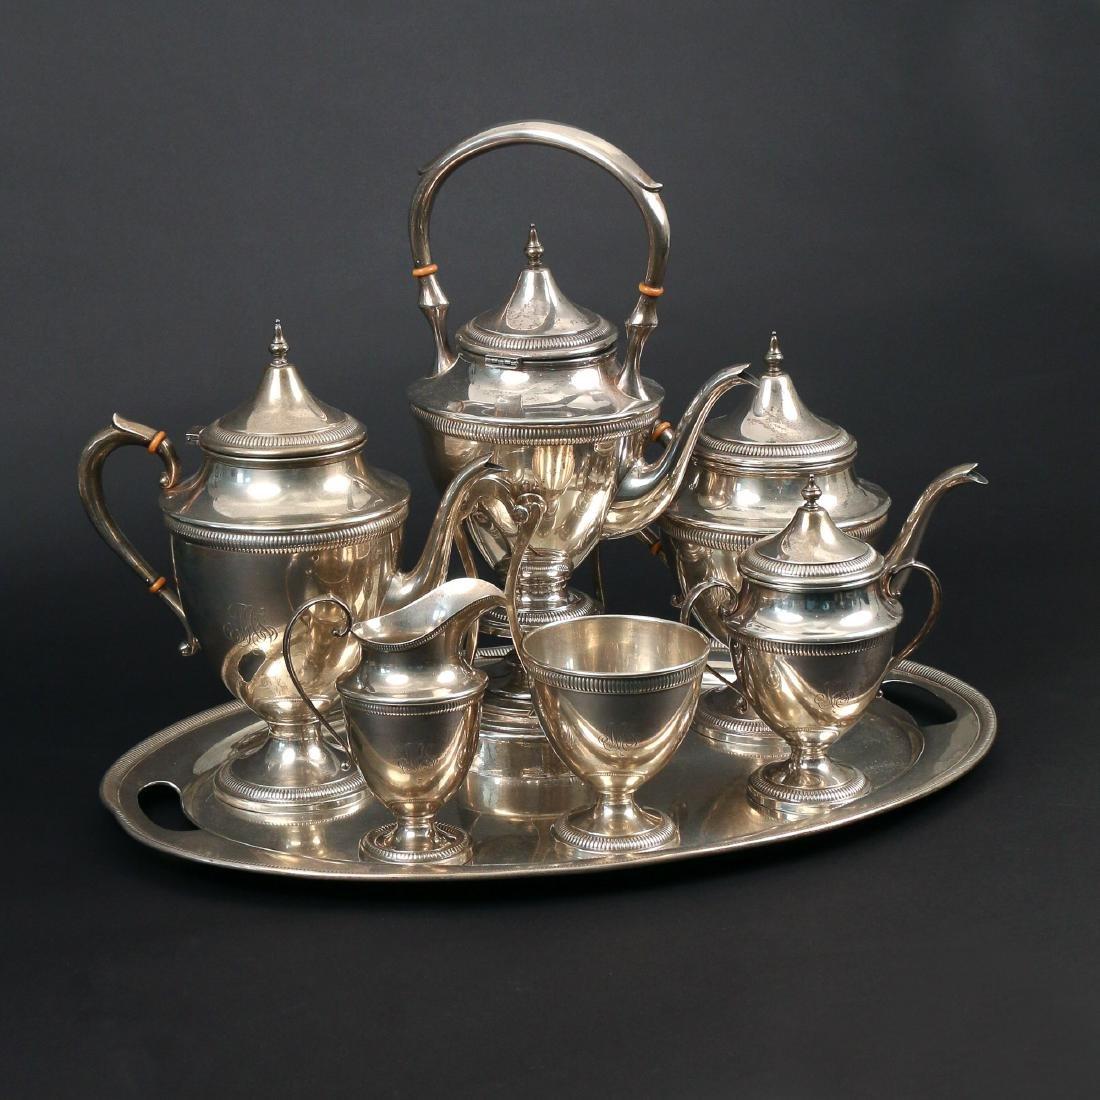 (7pc) STERLING SILVER TEA & COFFEE SERVICE